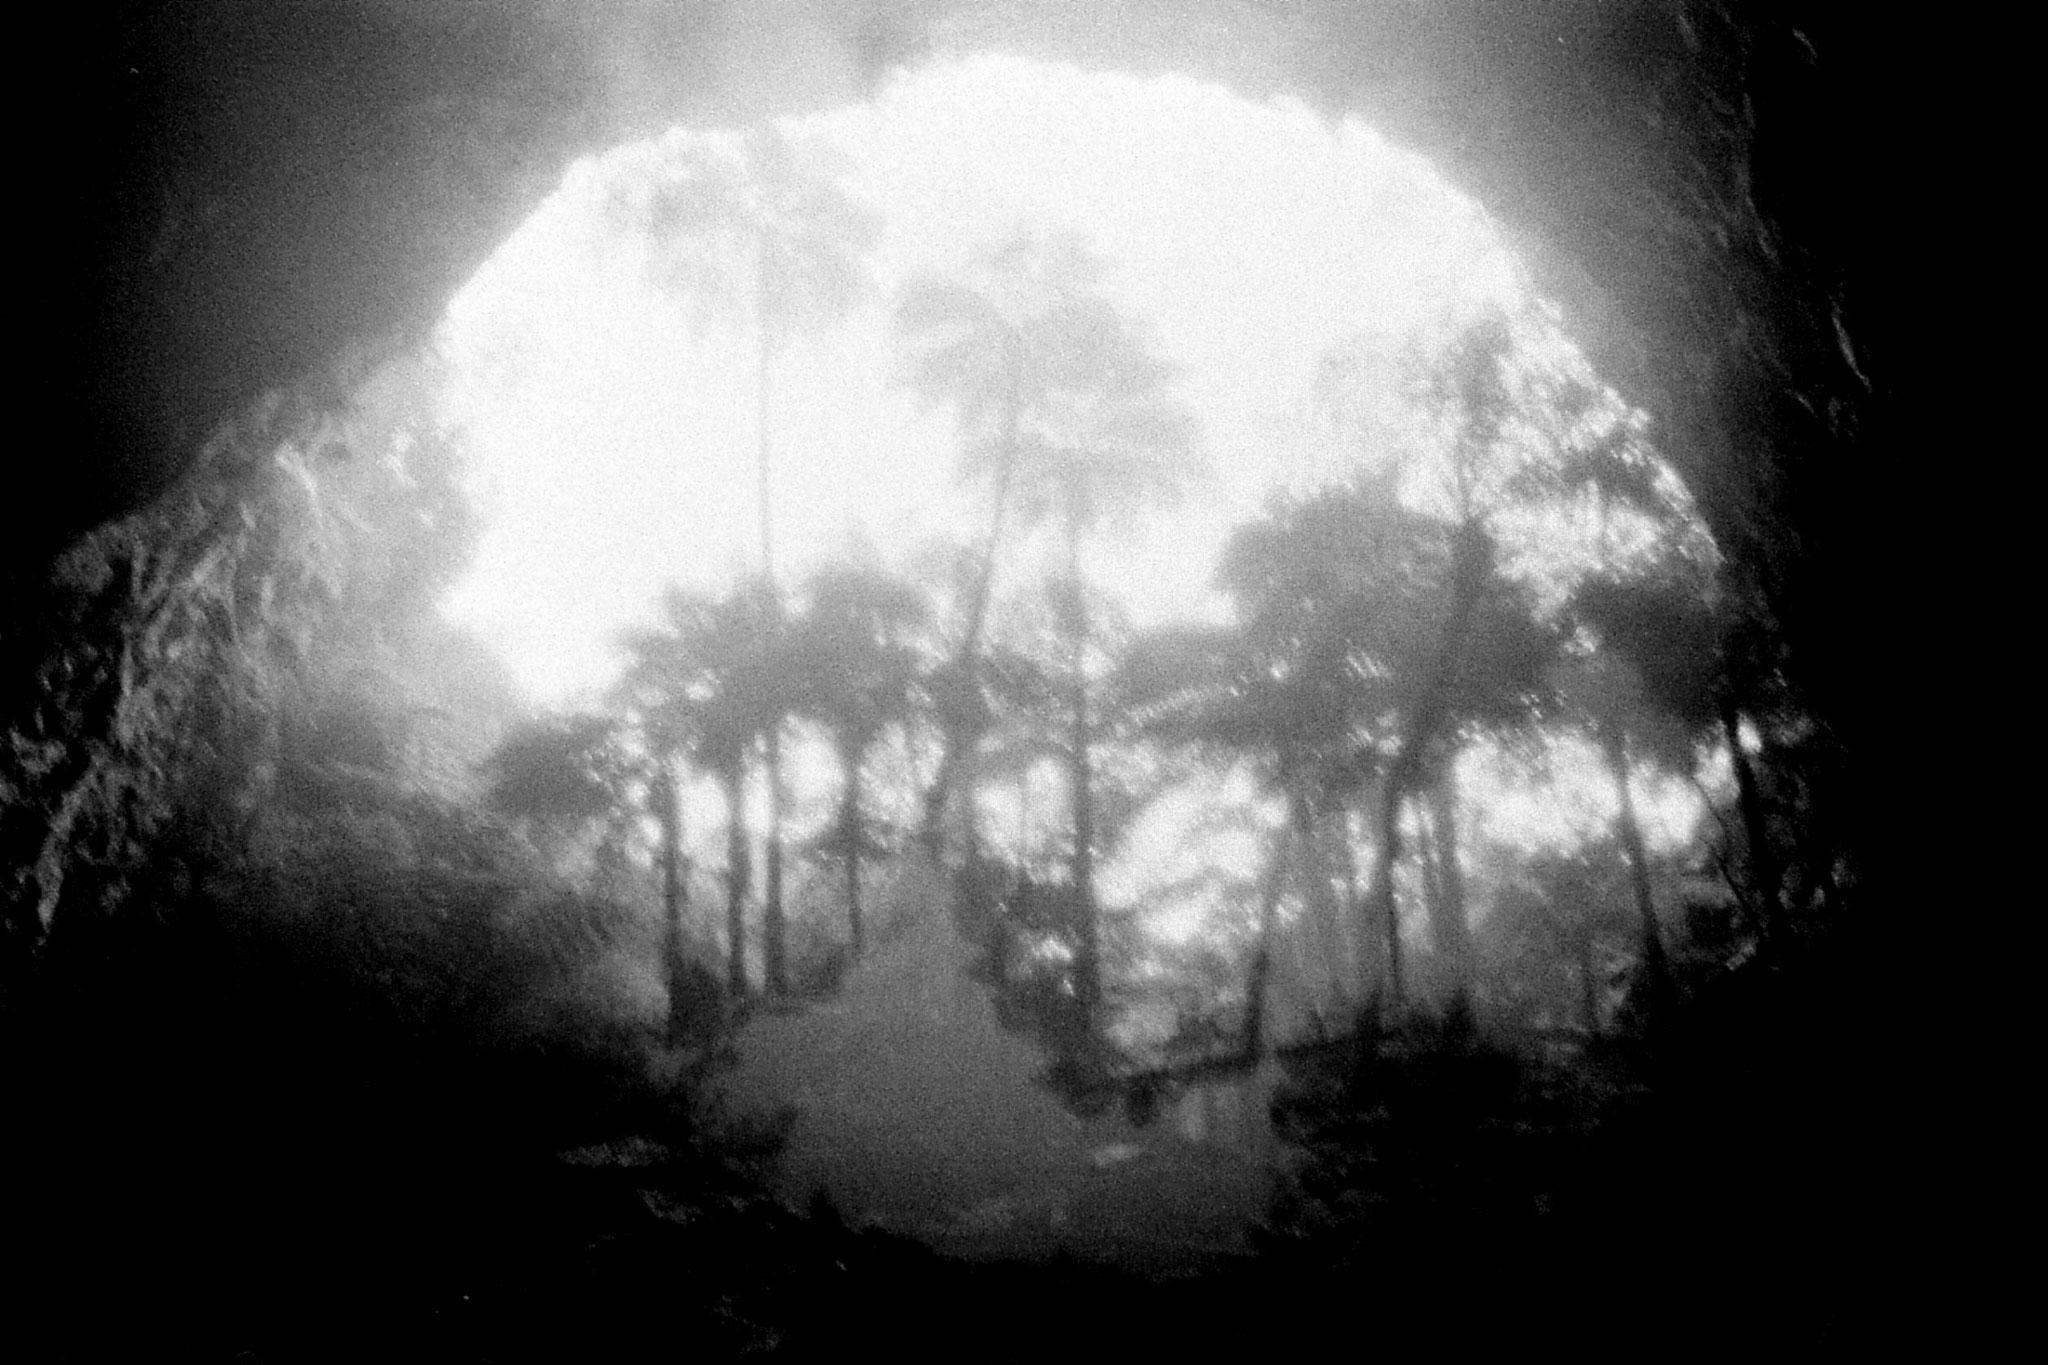 31/8/1990: 9: Orakeikorako opening of Ruatapu Cave